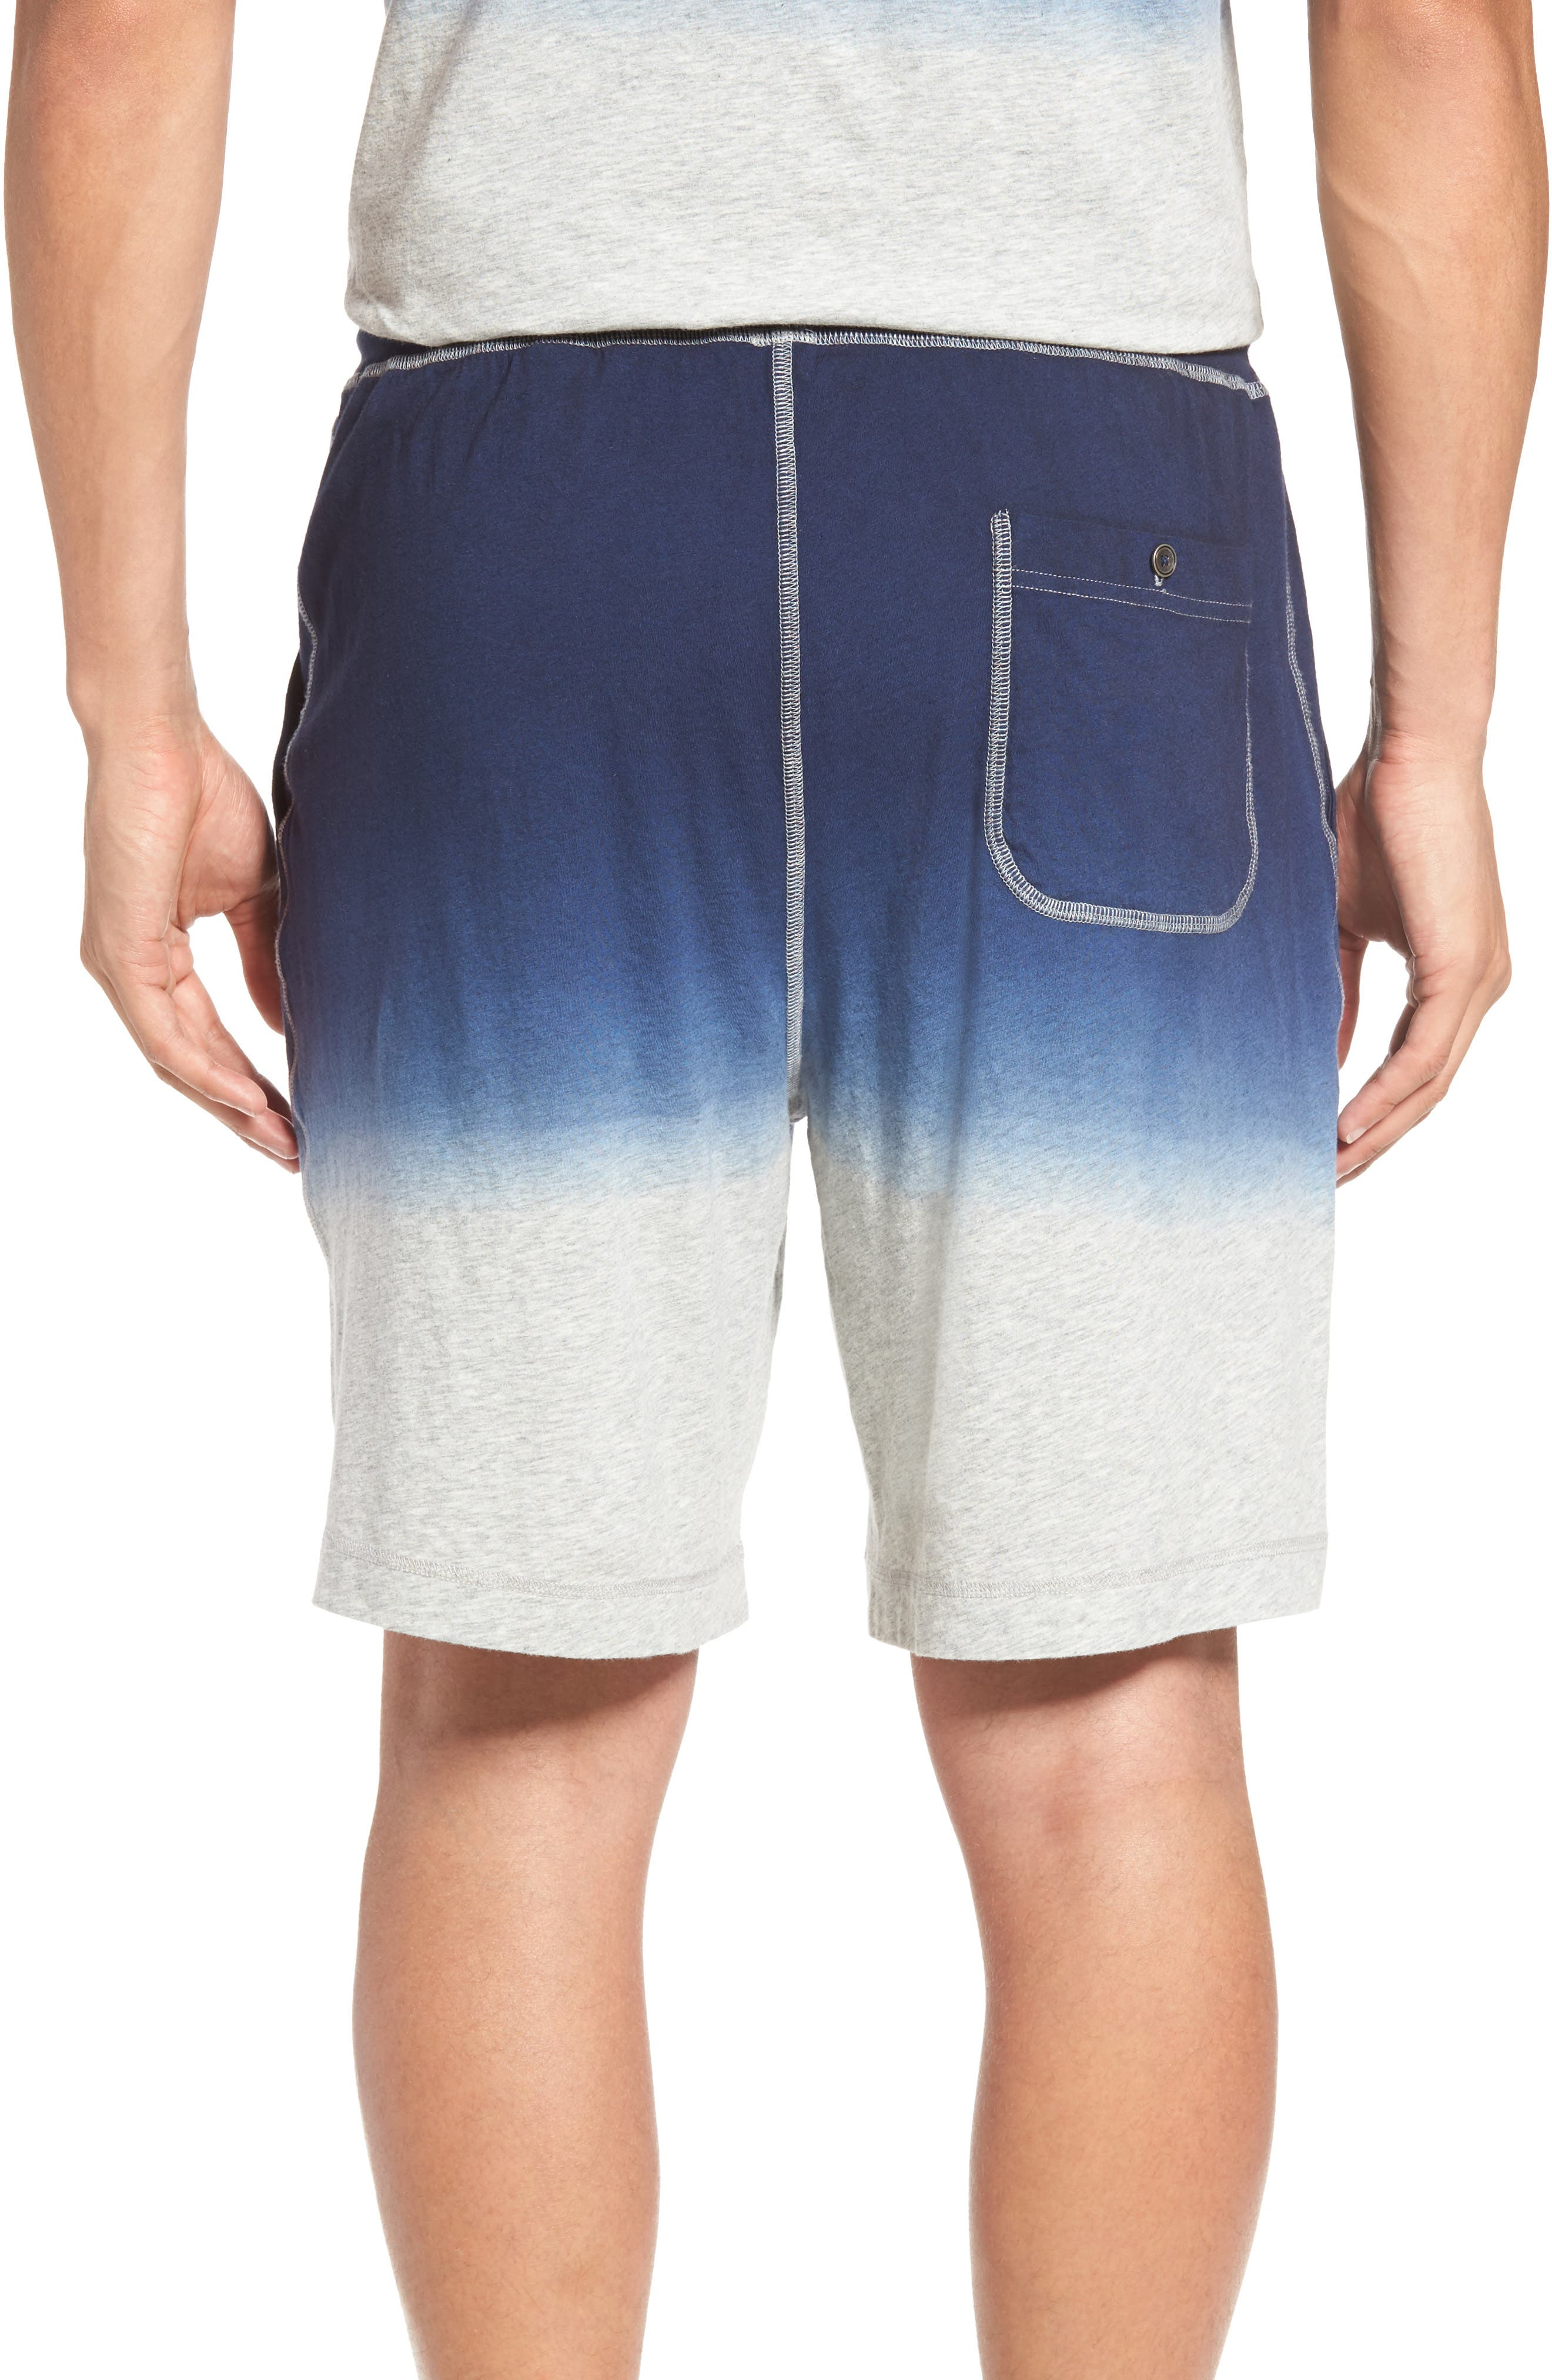 Dip Dye Lounge Shorts,                             Alternate thumbnail 2, color,                             Navy